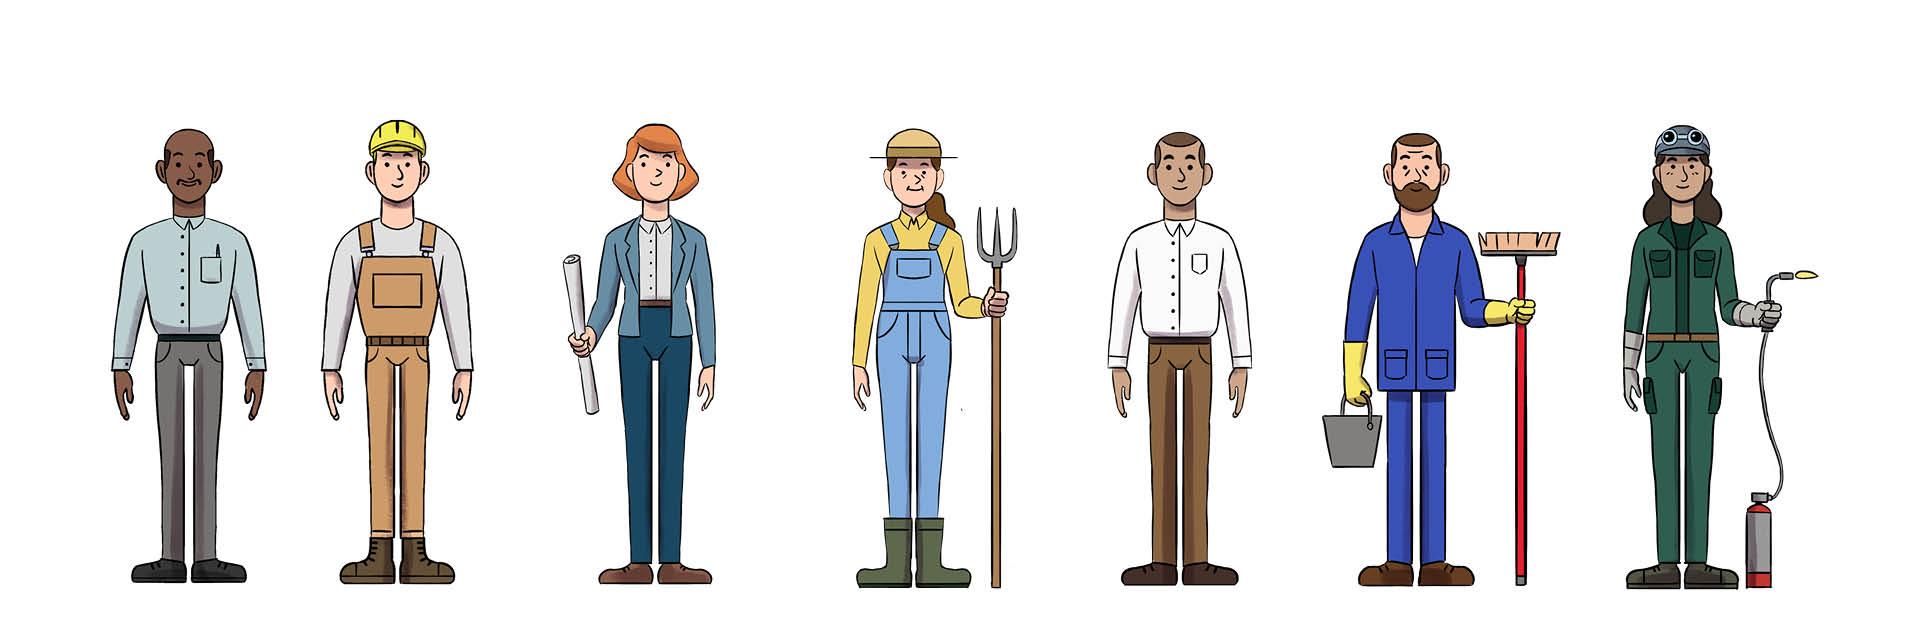 Profils de métiers illustrés